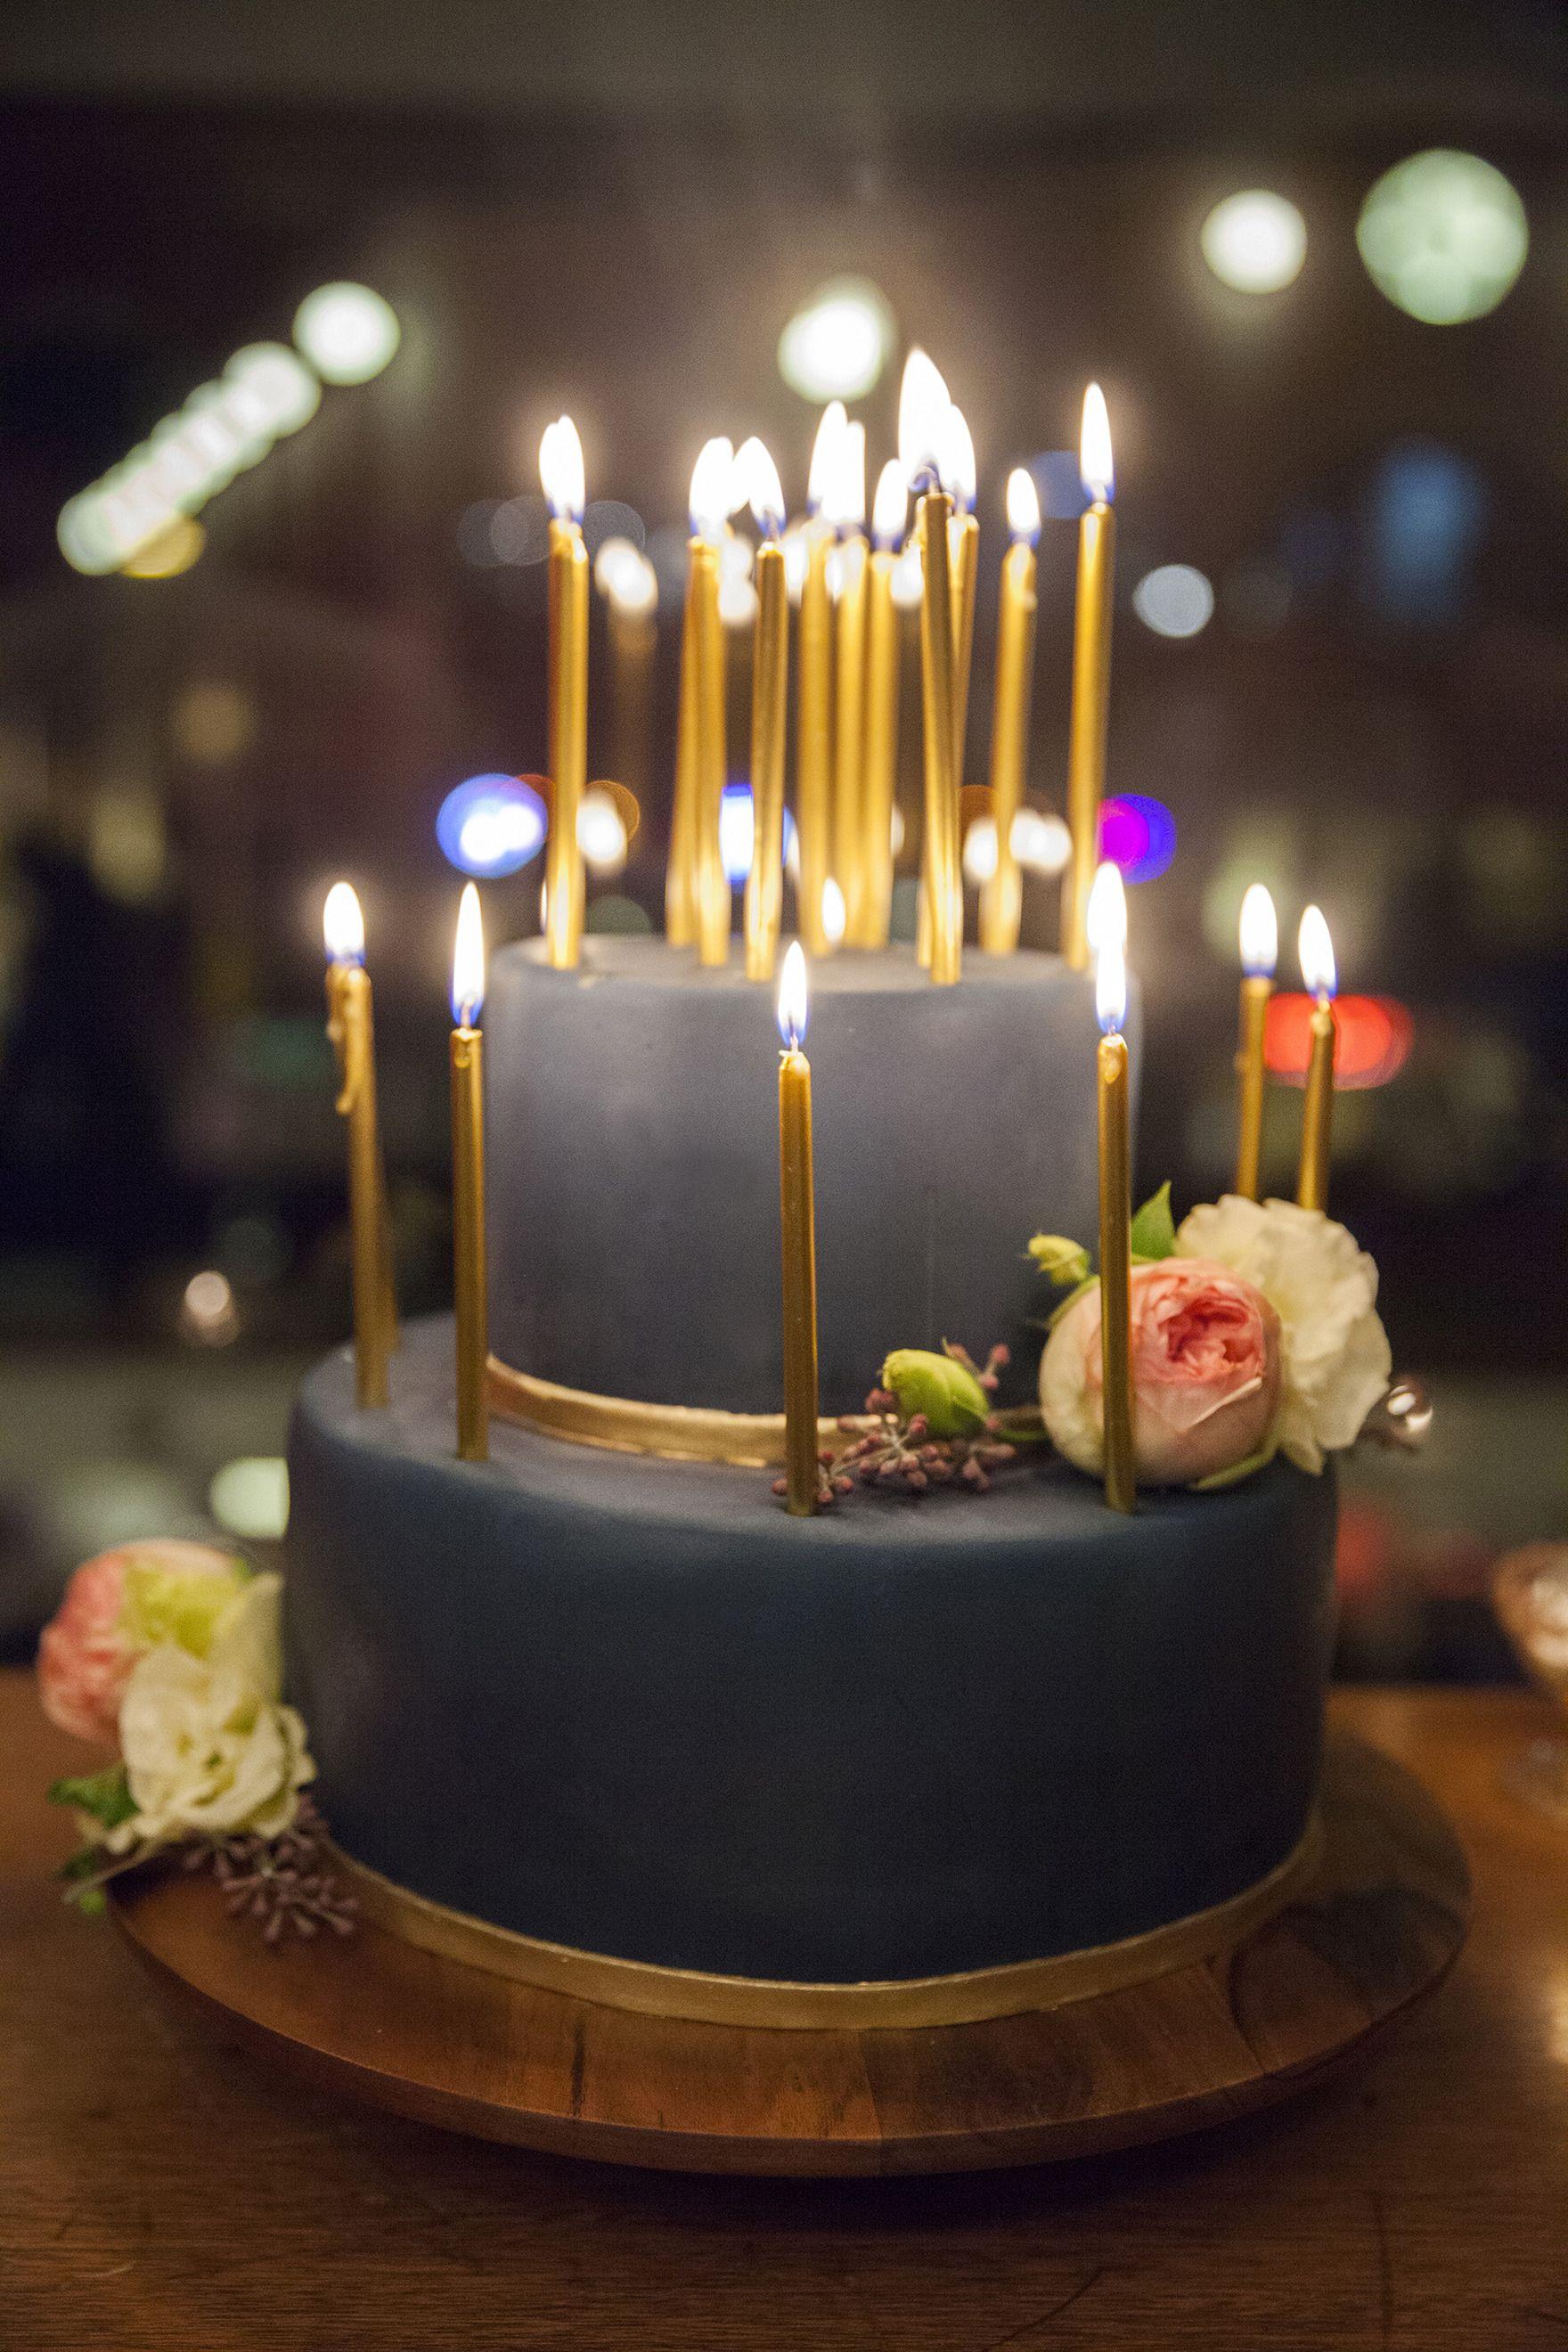 Sensational Elegant Birthday Cake Candles The Cake Boutique Personalised Birthday Cards Veneteletsinfo